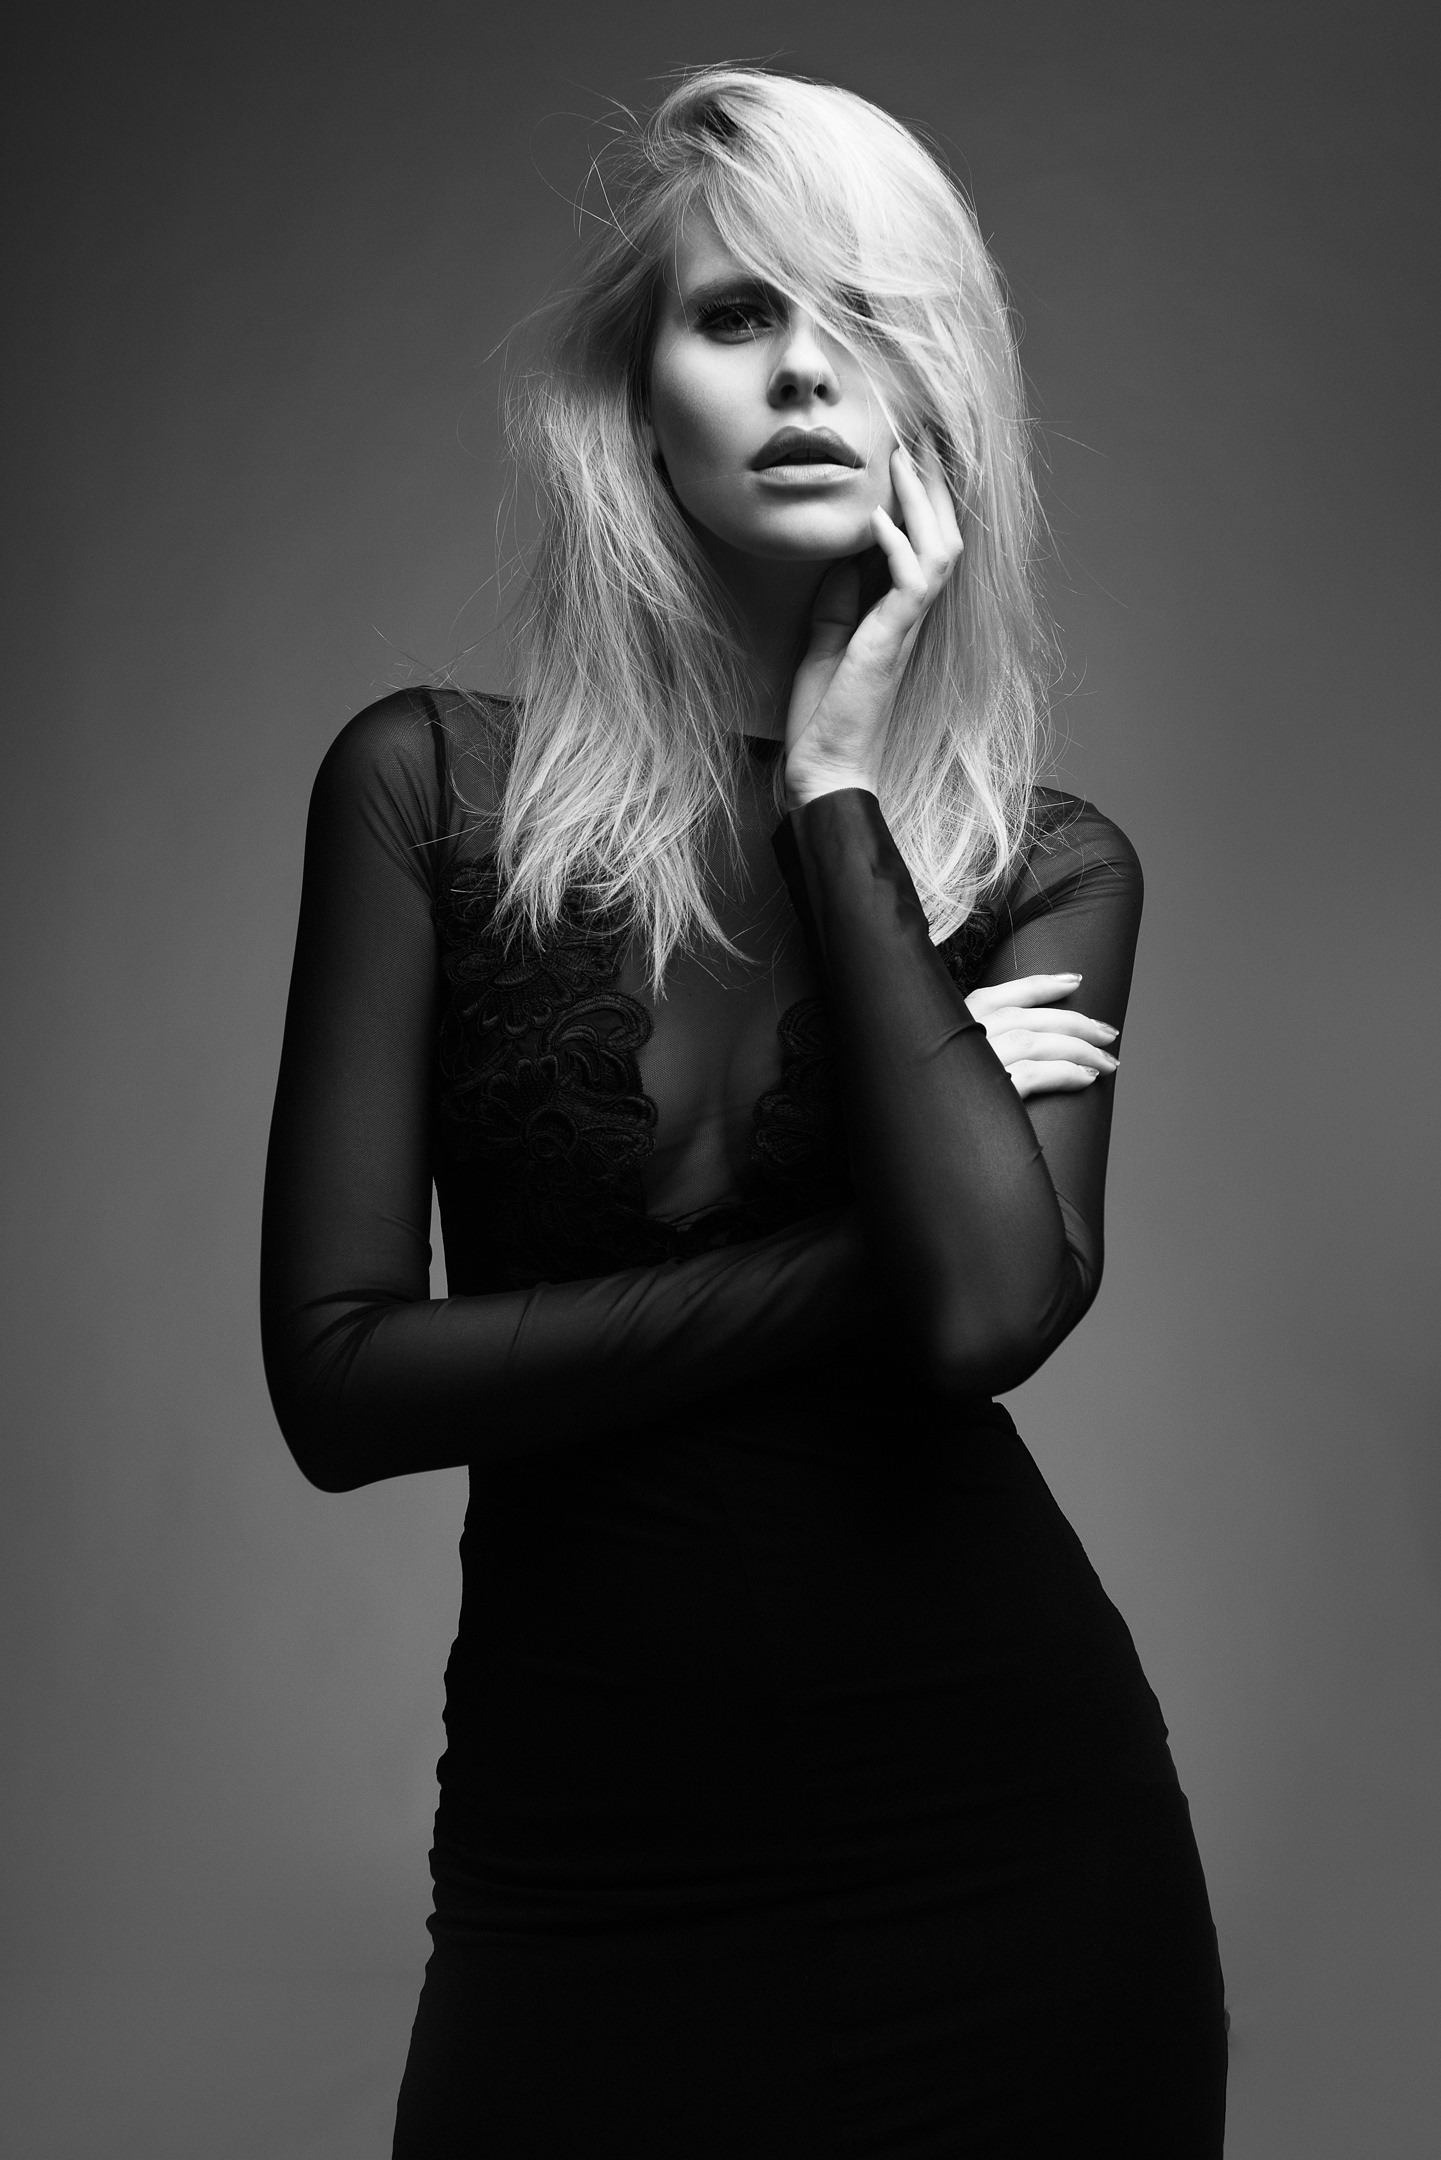 Maleficent-by-ANNA-BAZHANOVA-dh-7-1